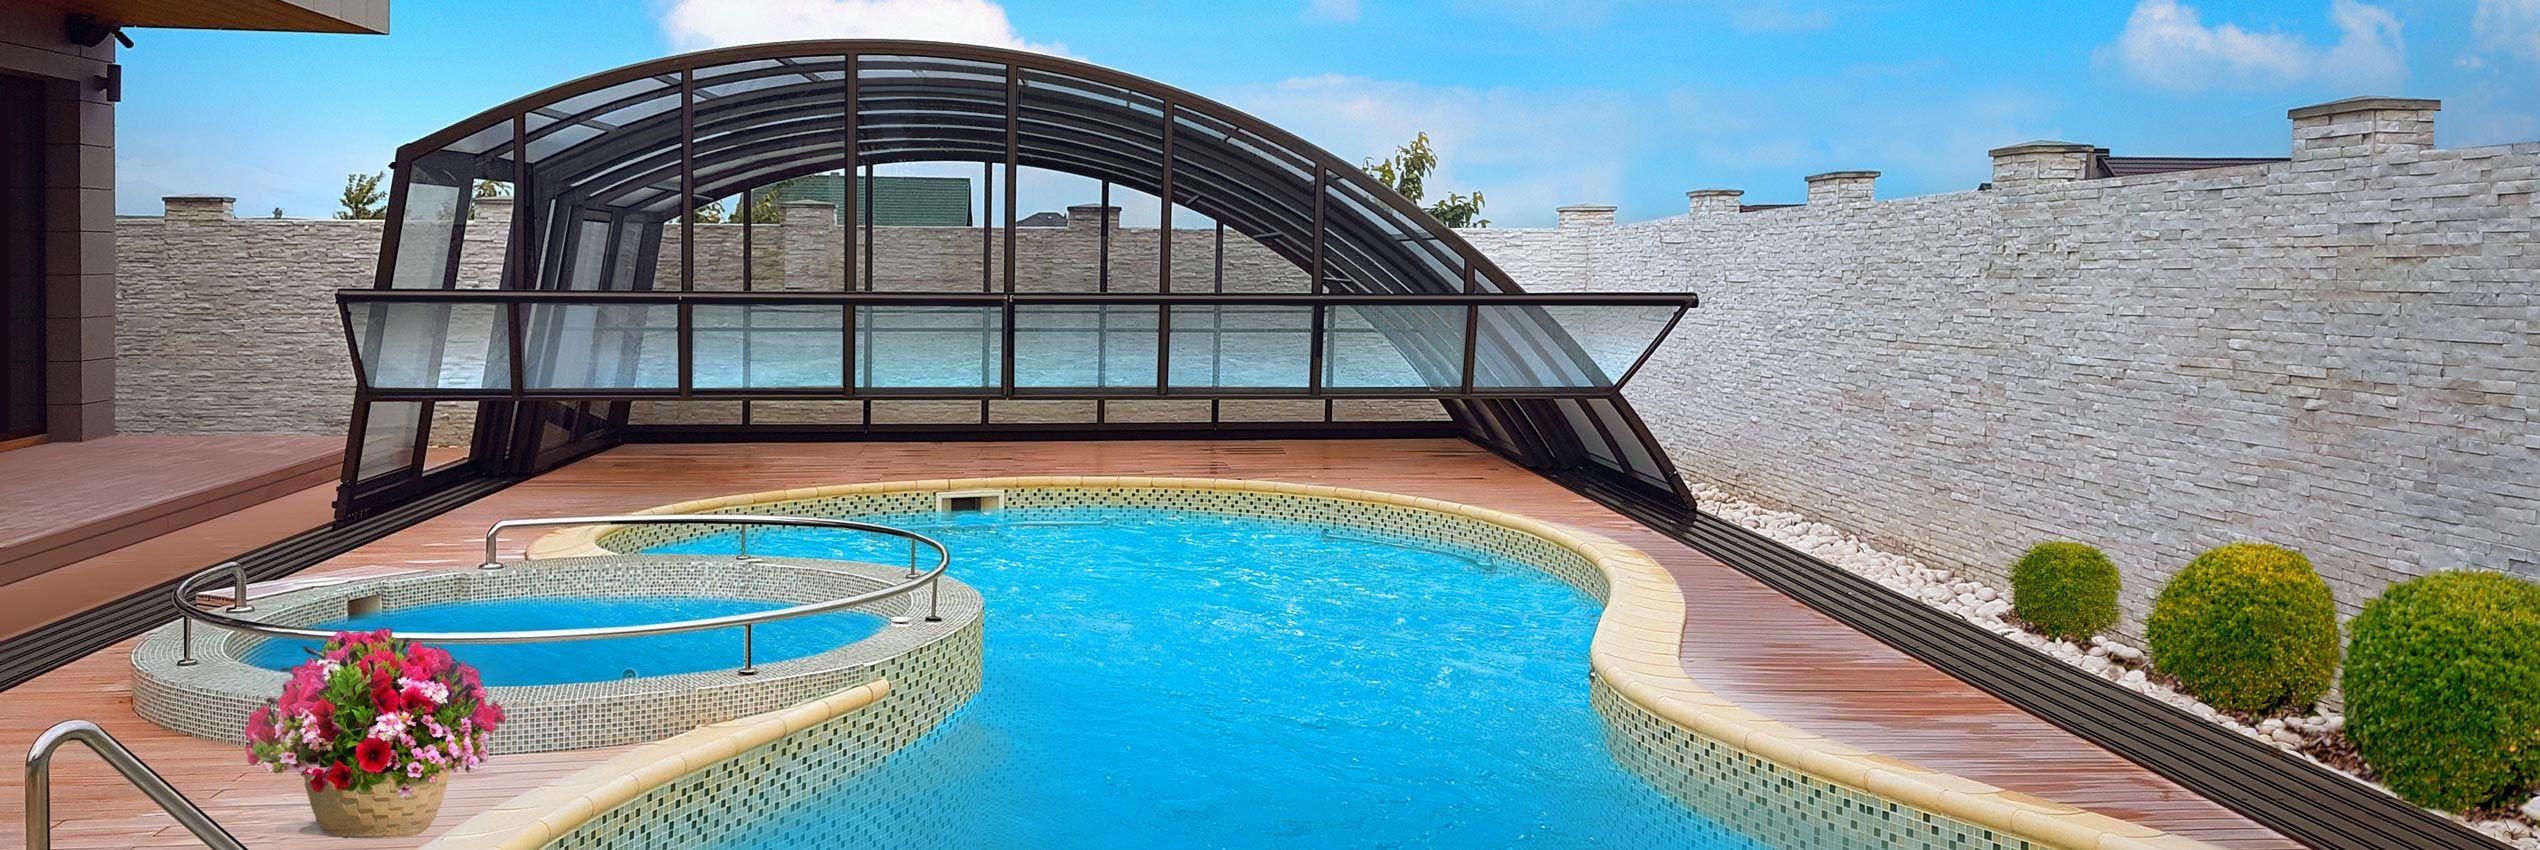 Copertura piscina aperta